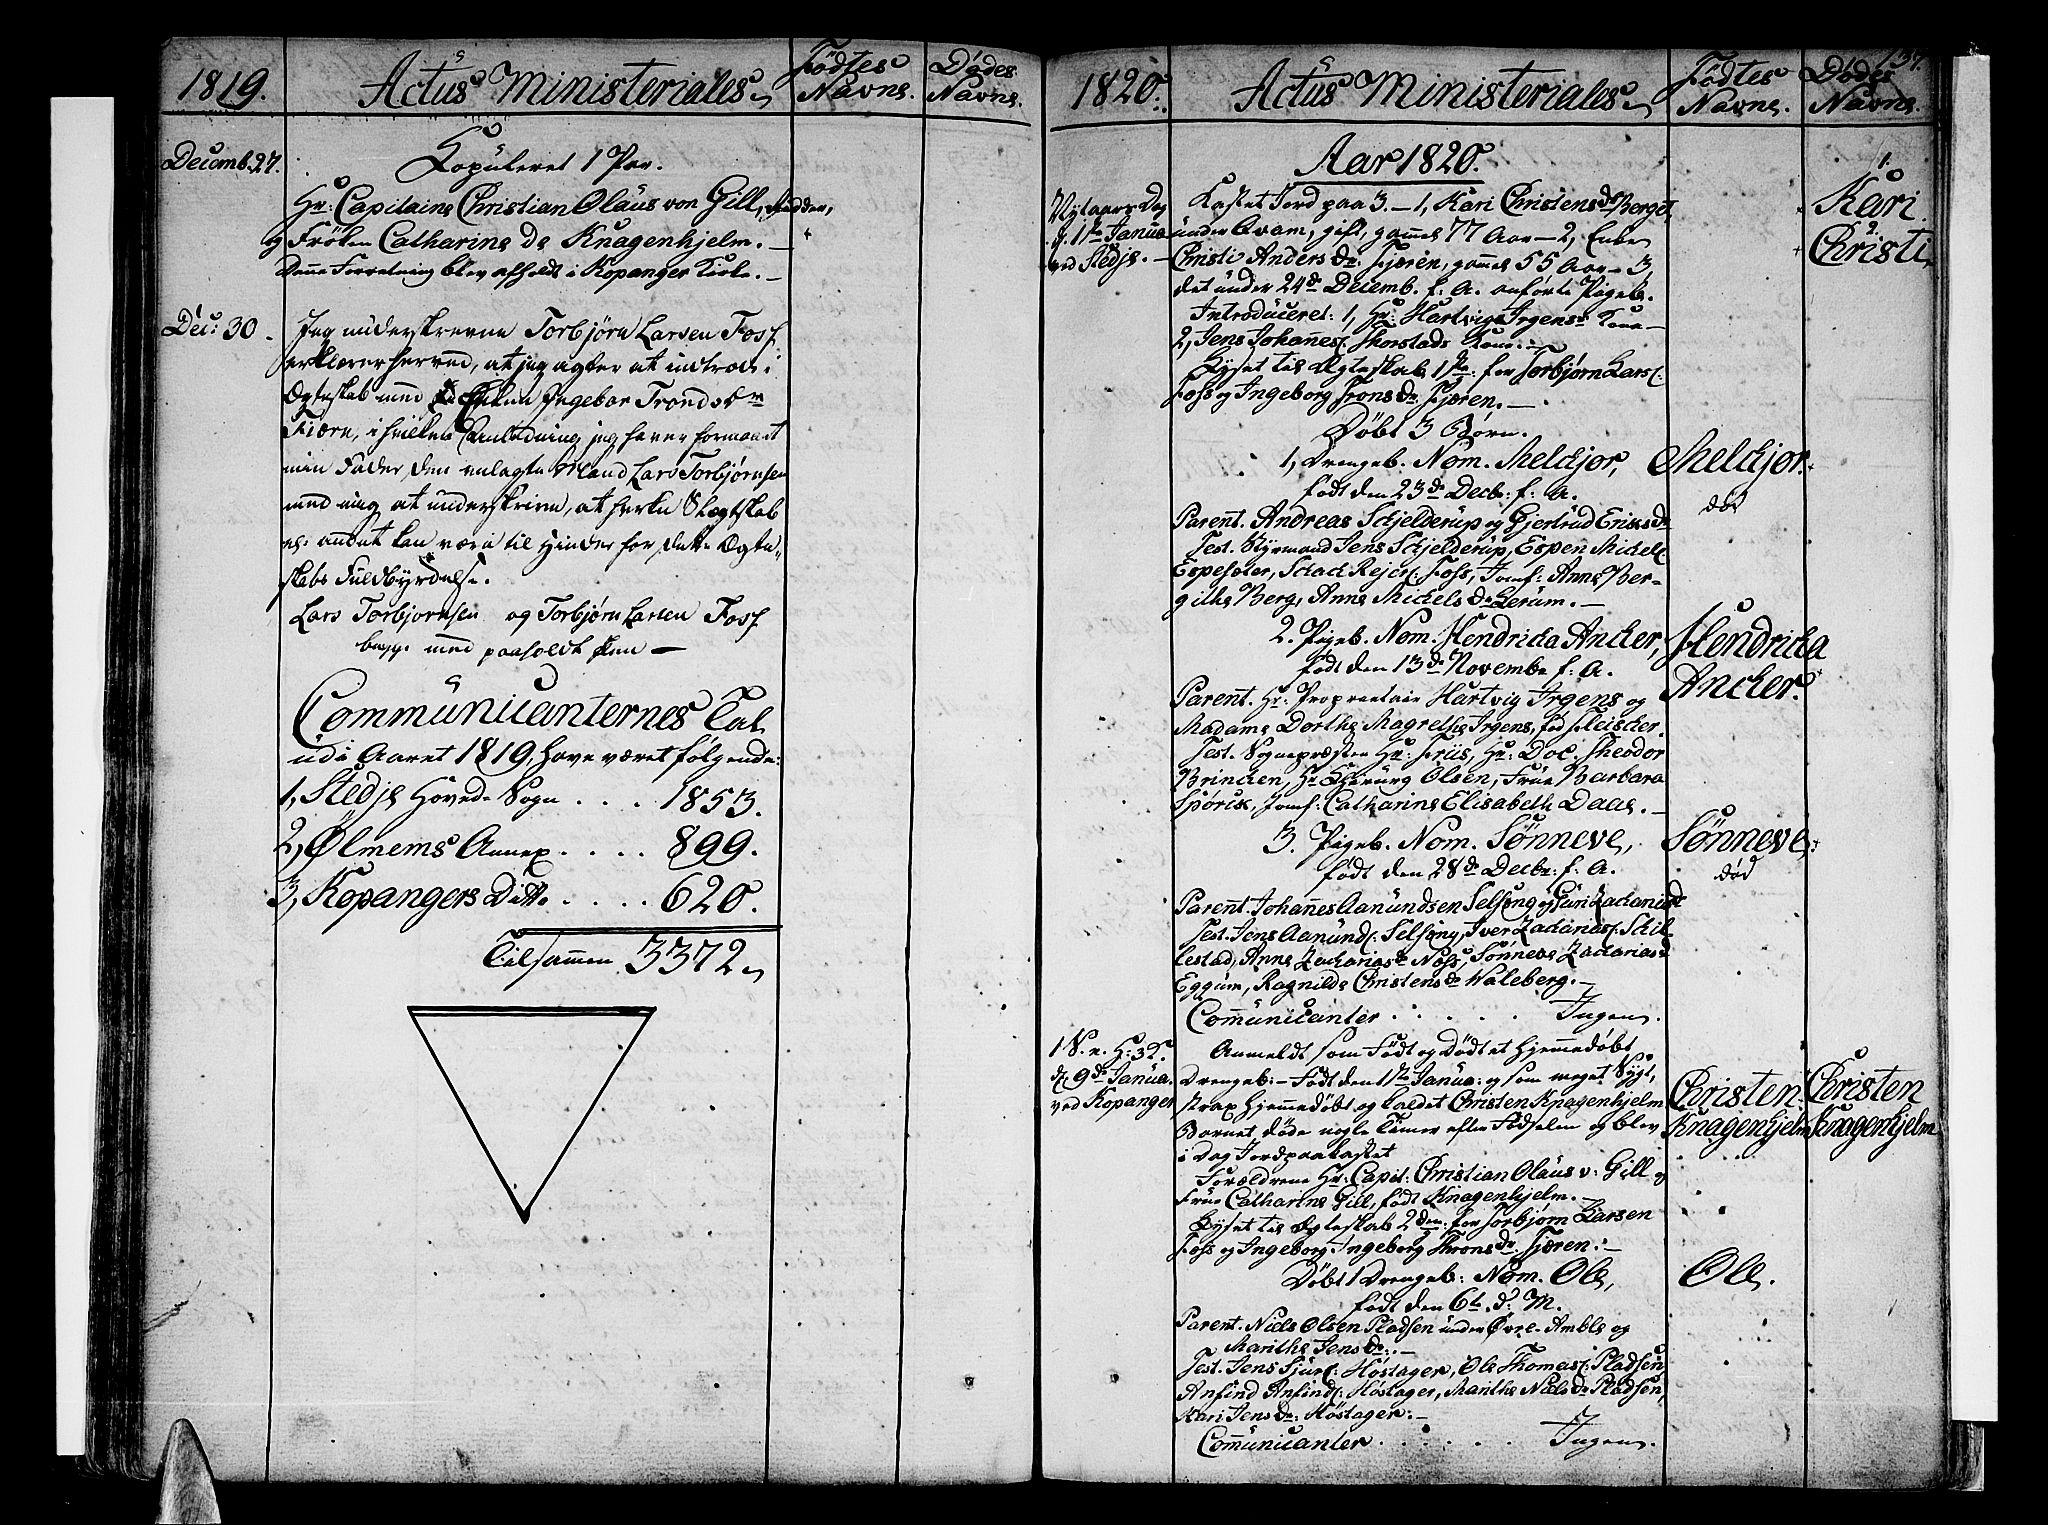 SAB, Sogndal sokneprestembete, H/Haa/Haaa/L0009: Ministerialbok nr. A 9, 1809-1821, s. 137